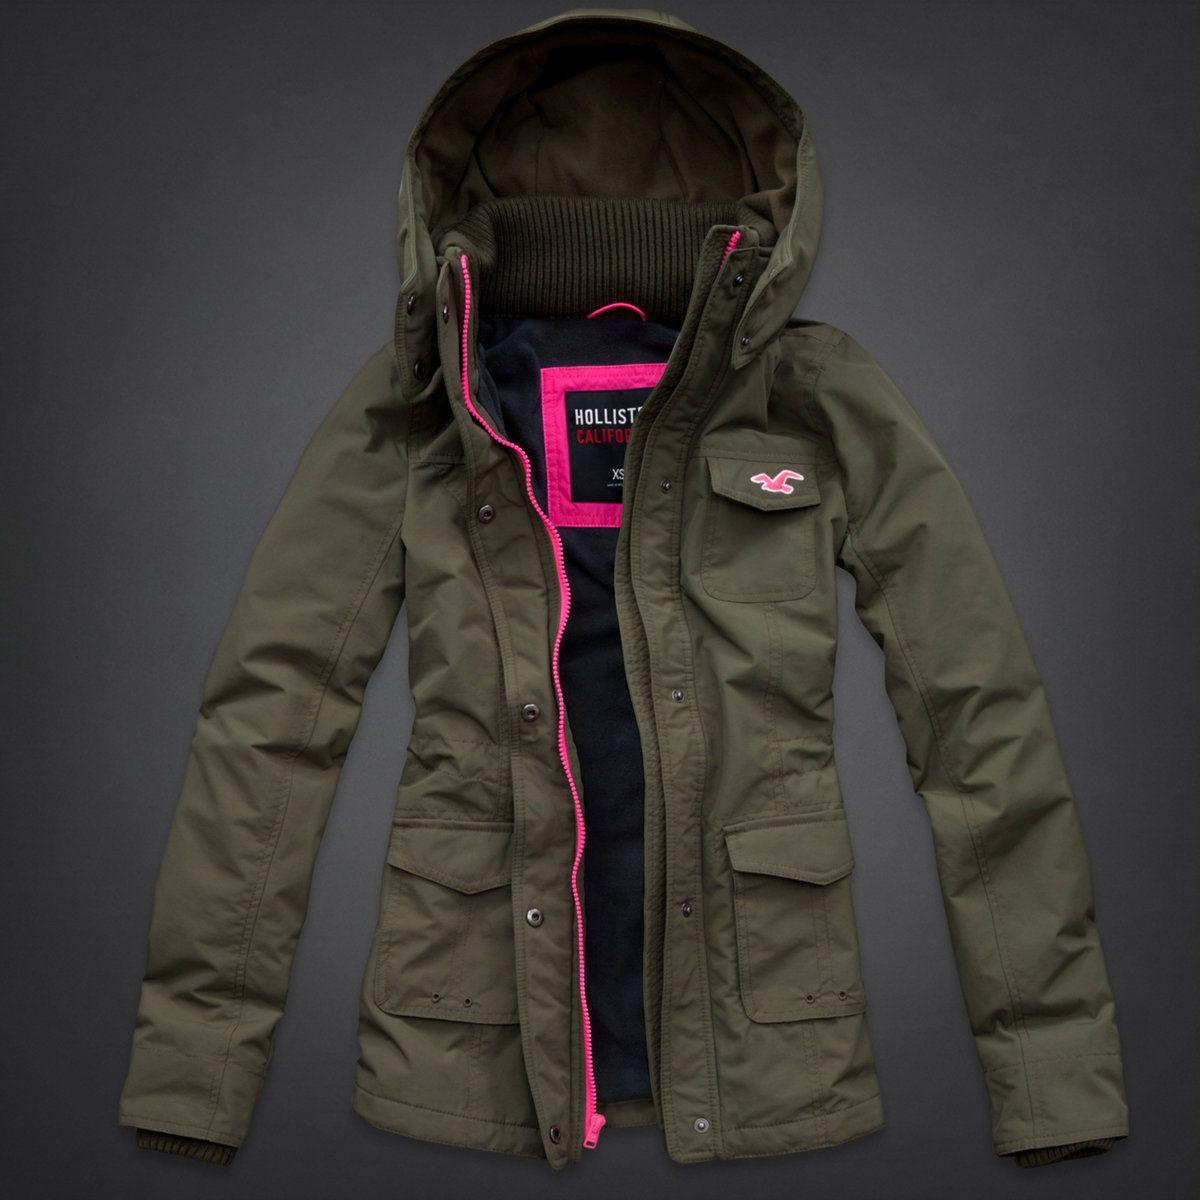 Weather Fleece Lined Jacket | Olive jacket, Hollister and Weather